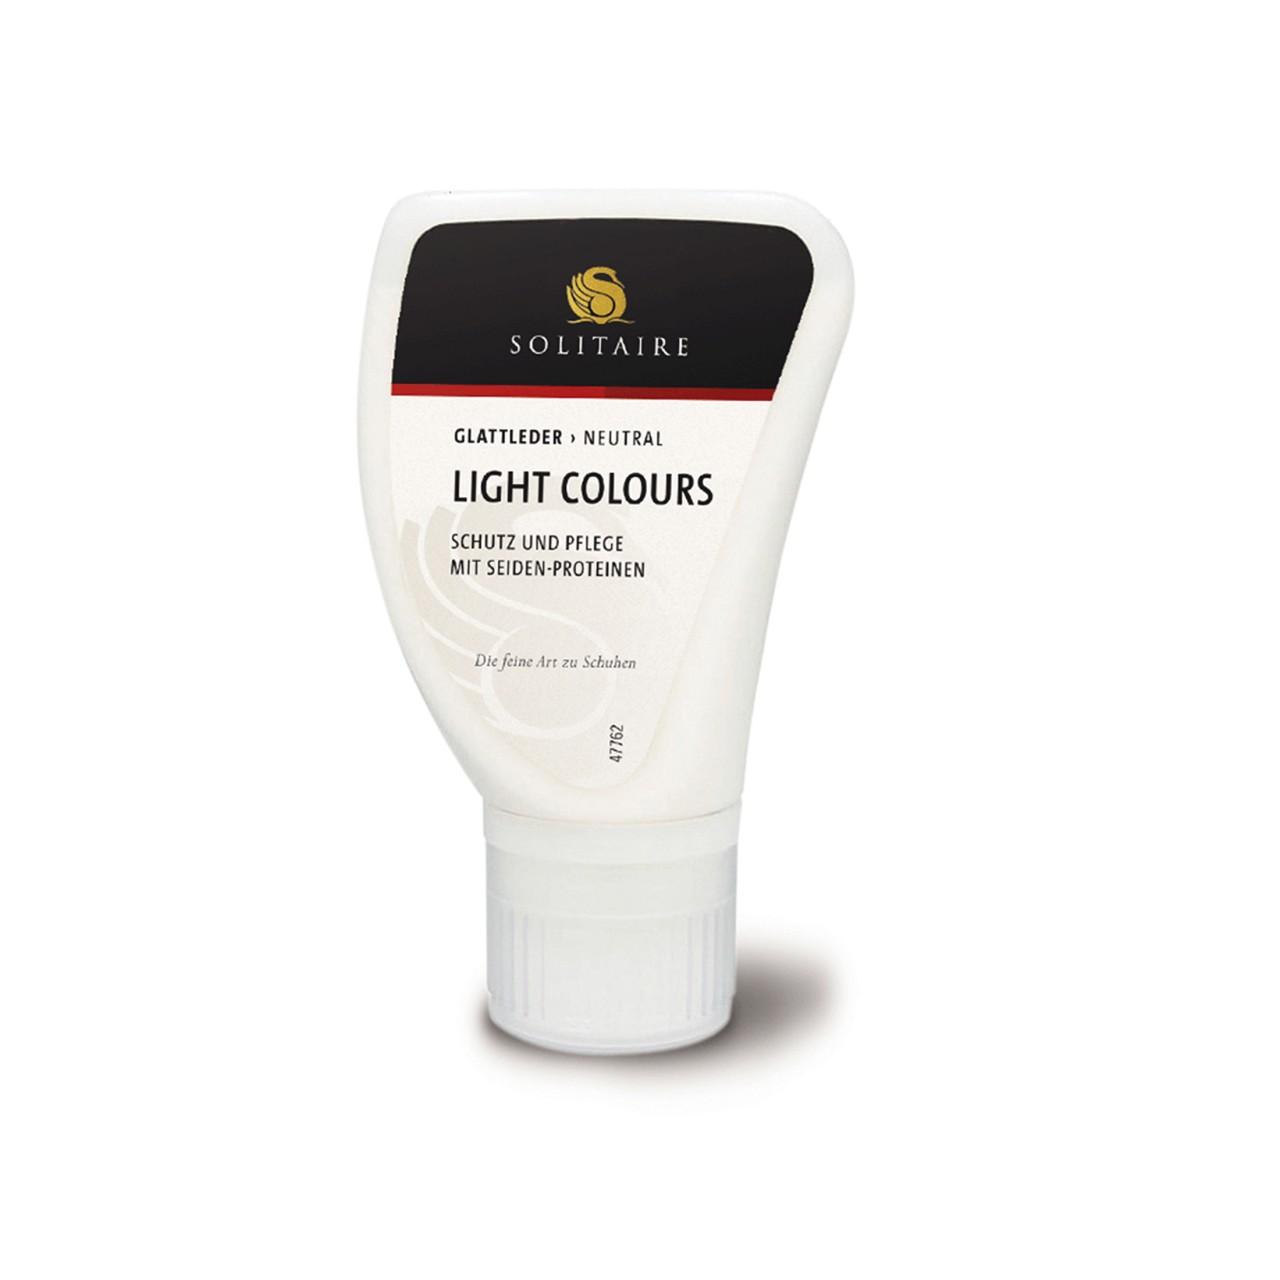 SOLITAIRE Light Colors Schutz und Pflege